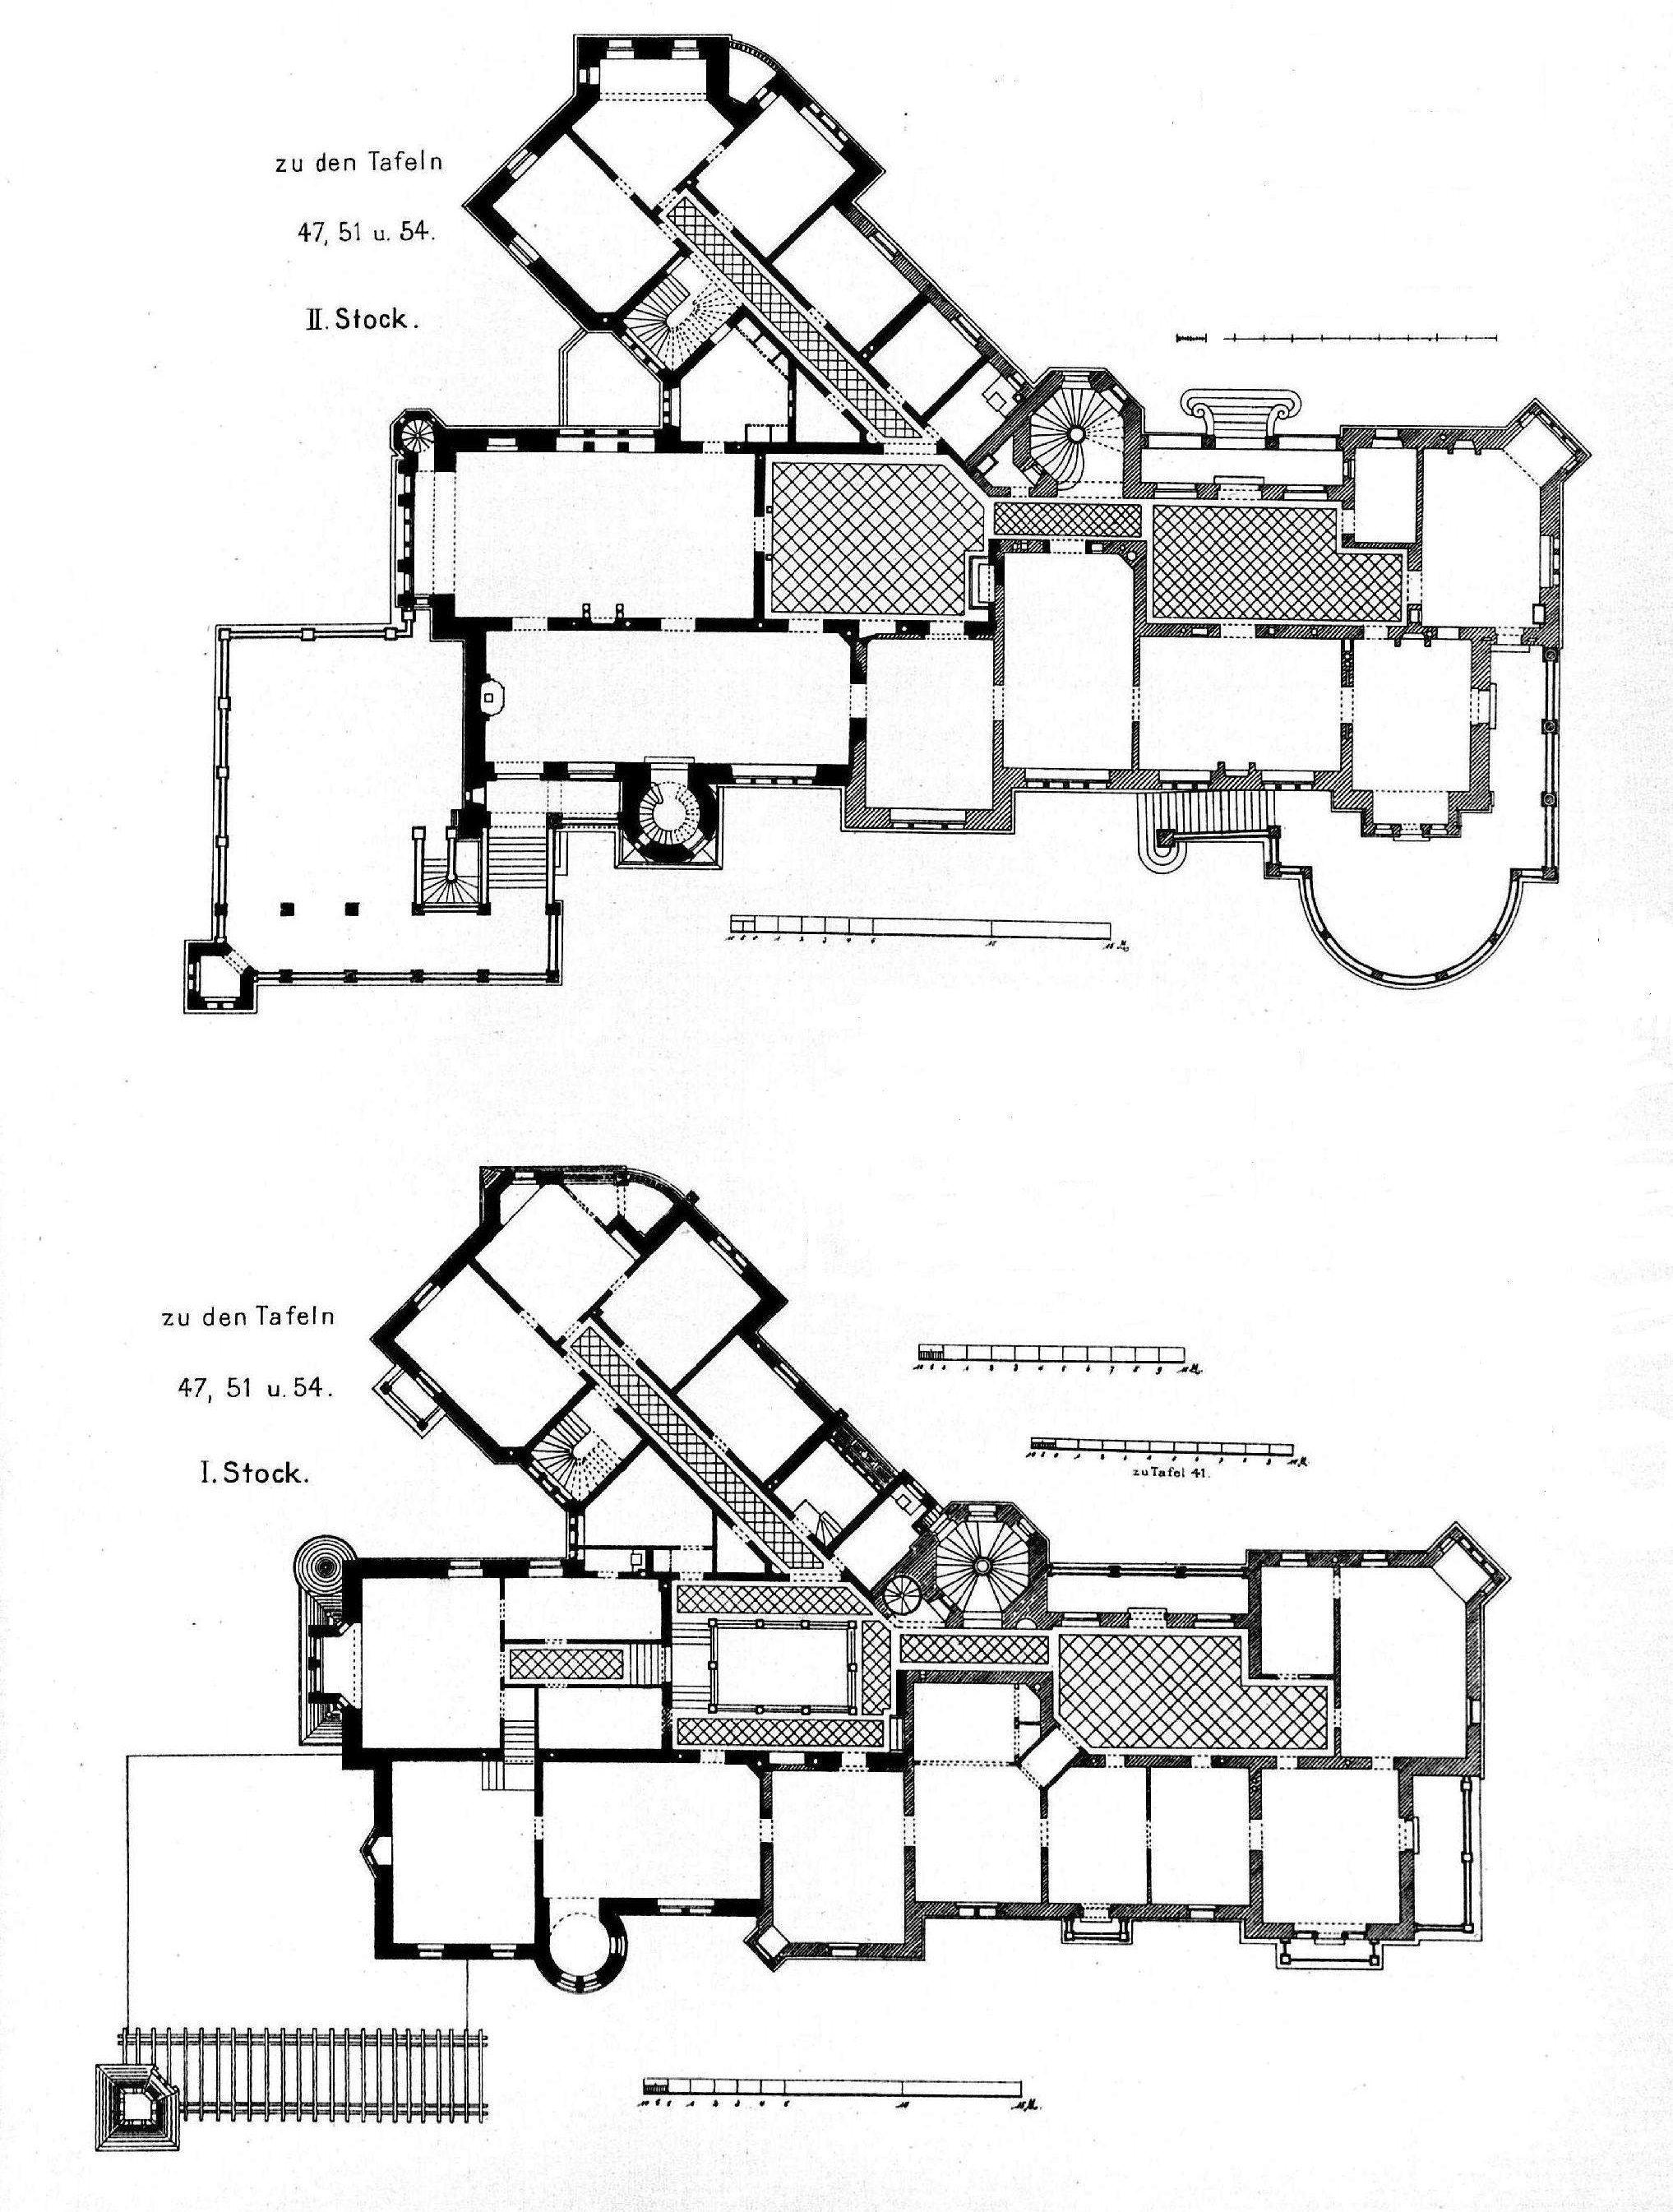 schlo langenzell plans pinterest architecture. Black Bedroom Furniture Sets. Home Design Ideas